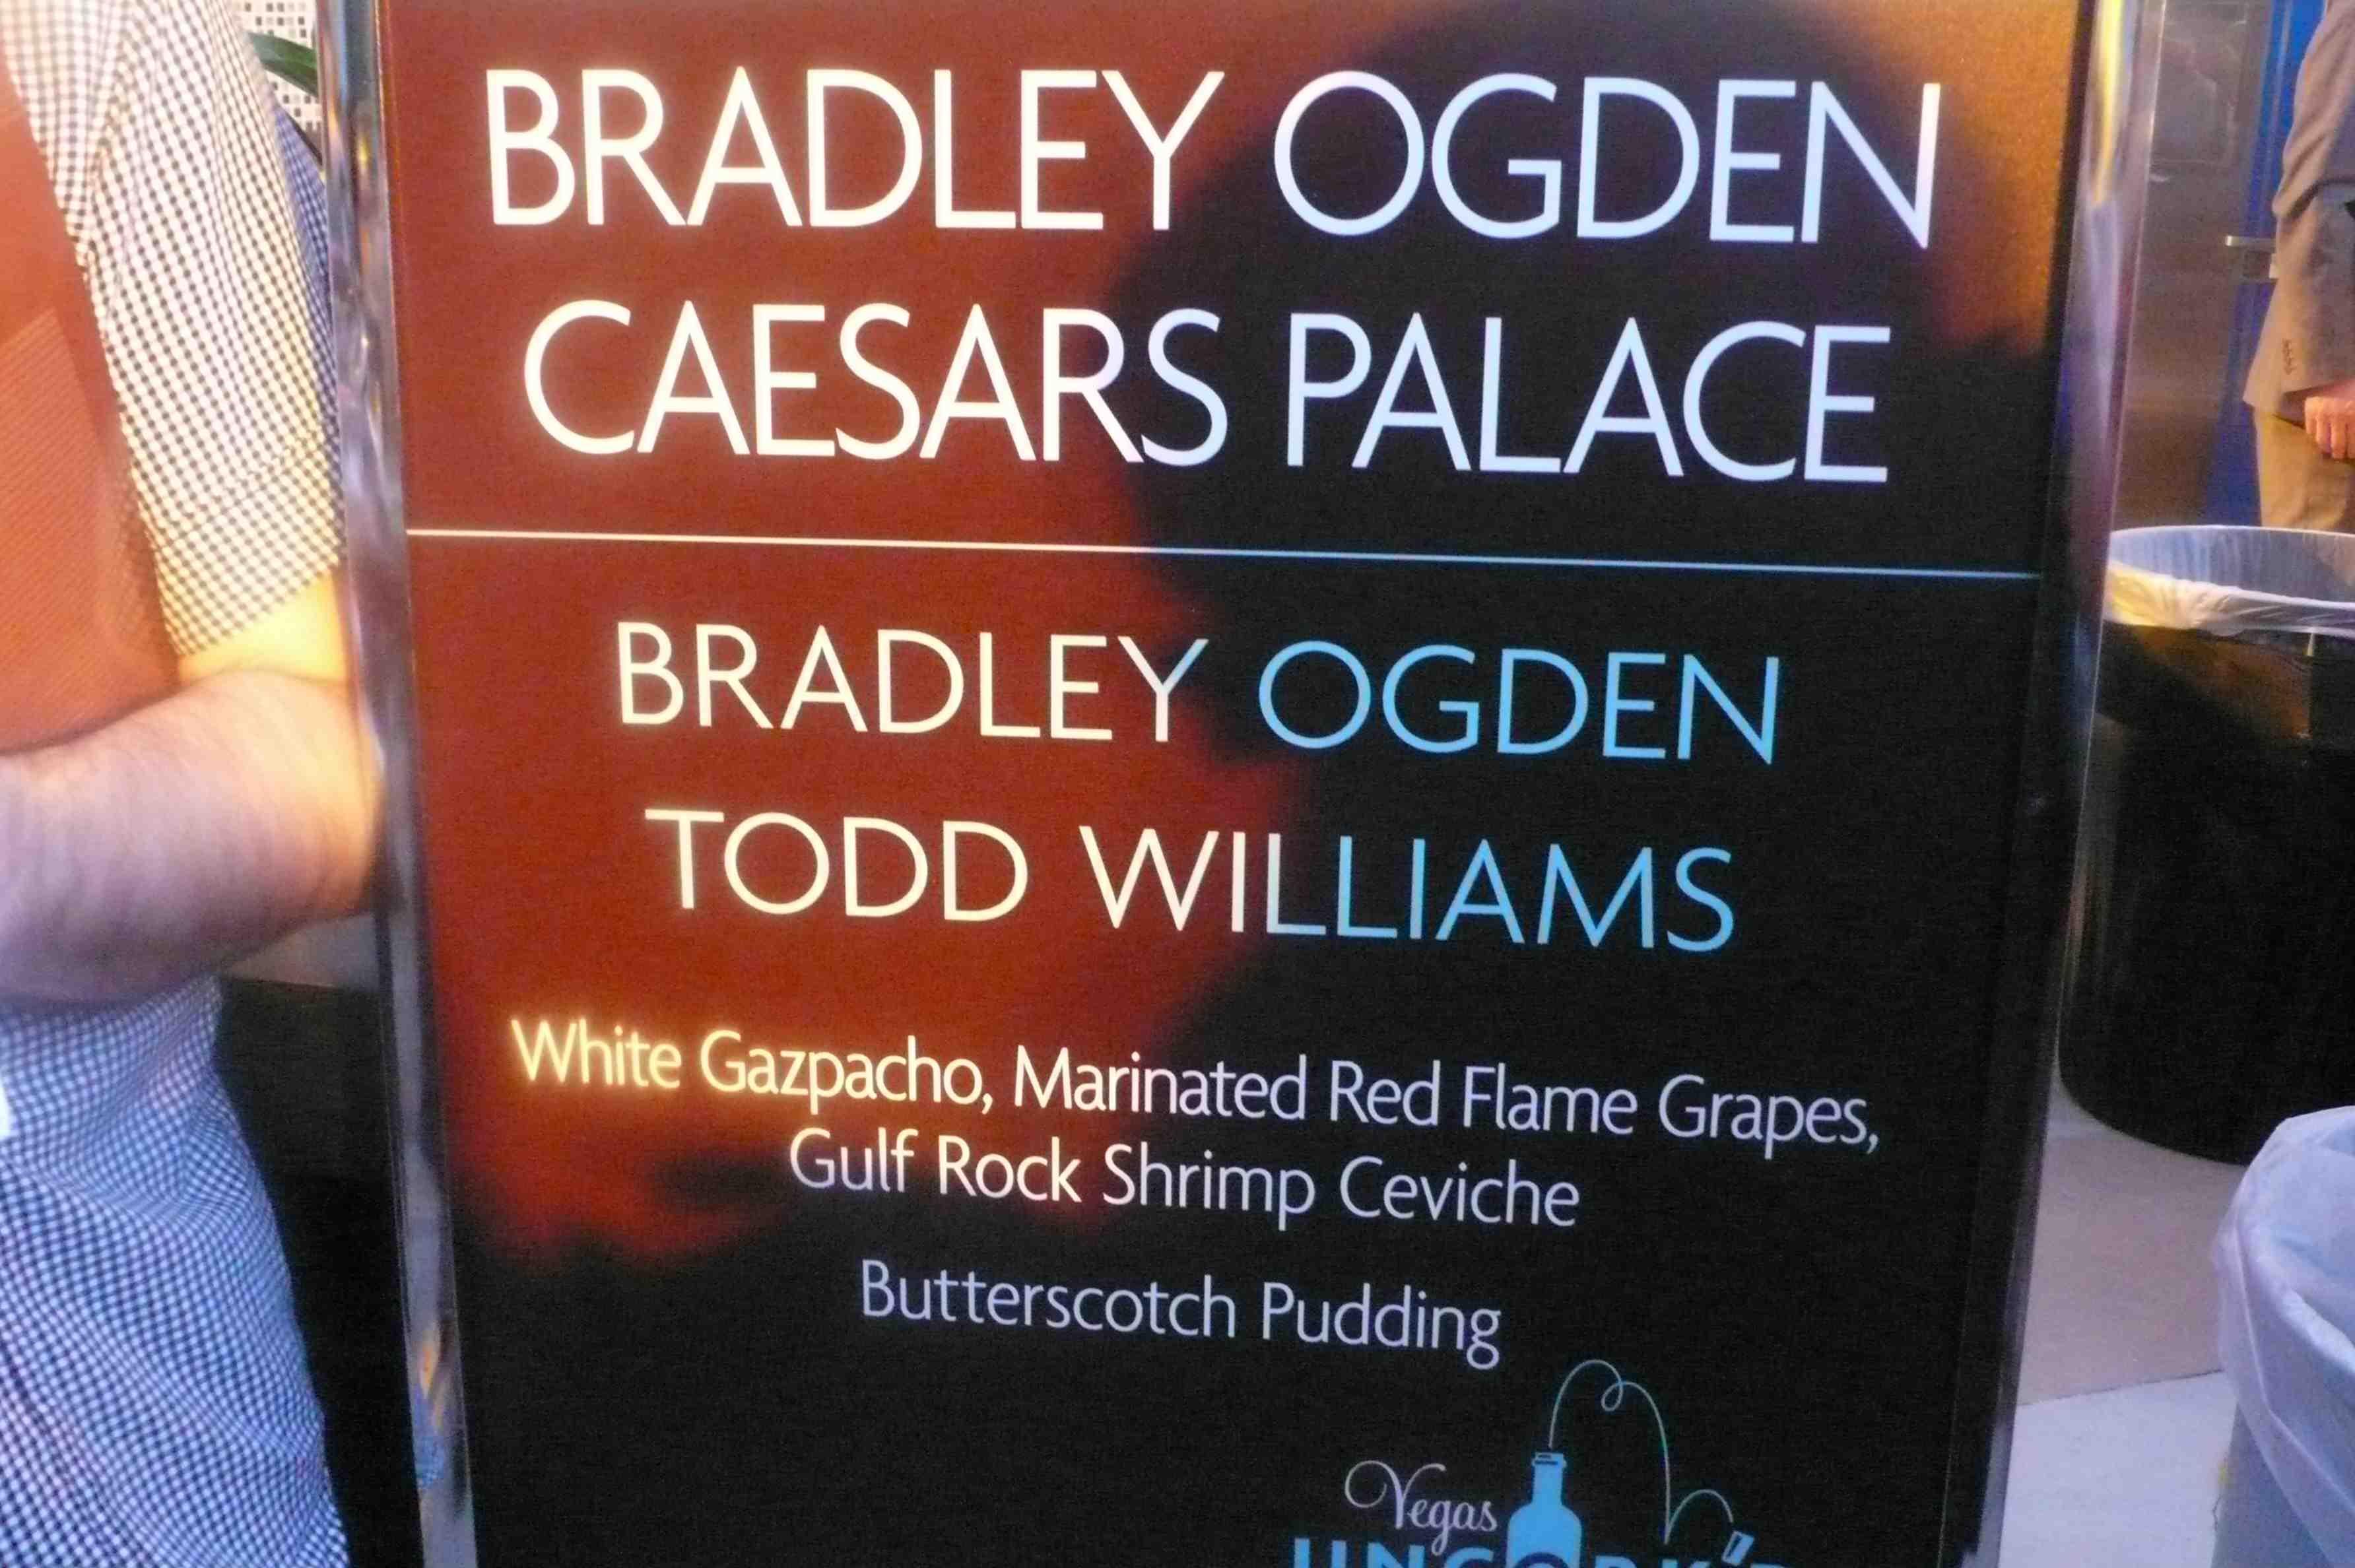 Bradley Ogden, Caesars